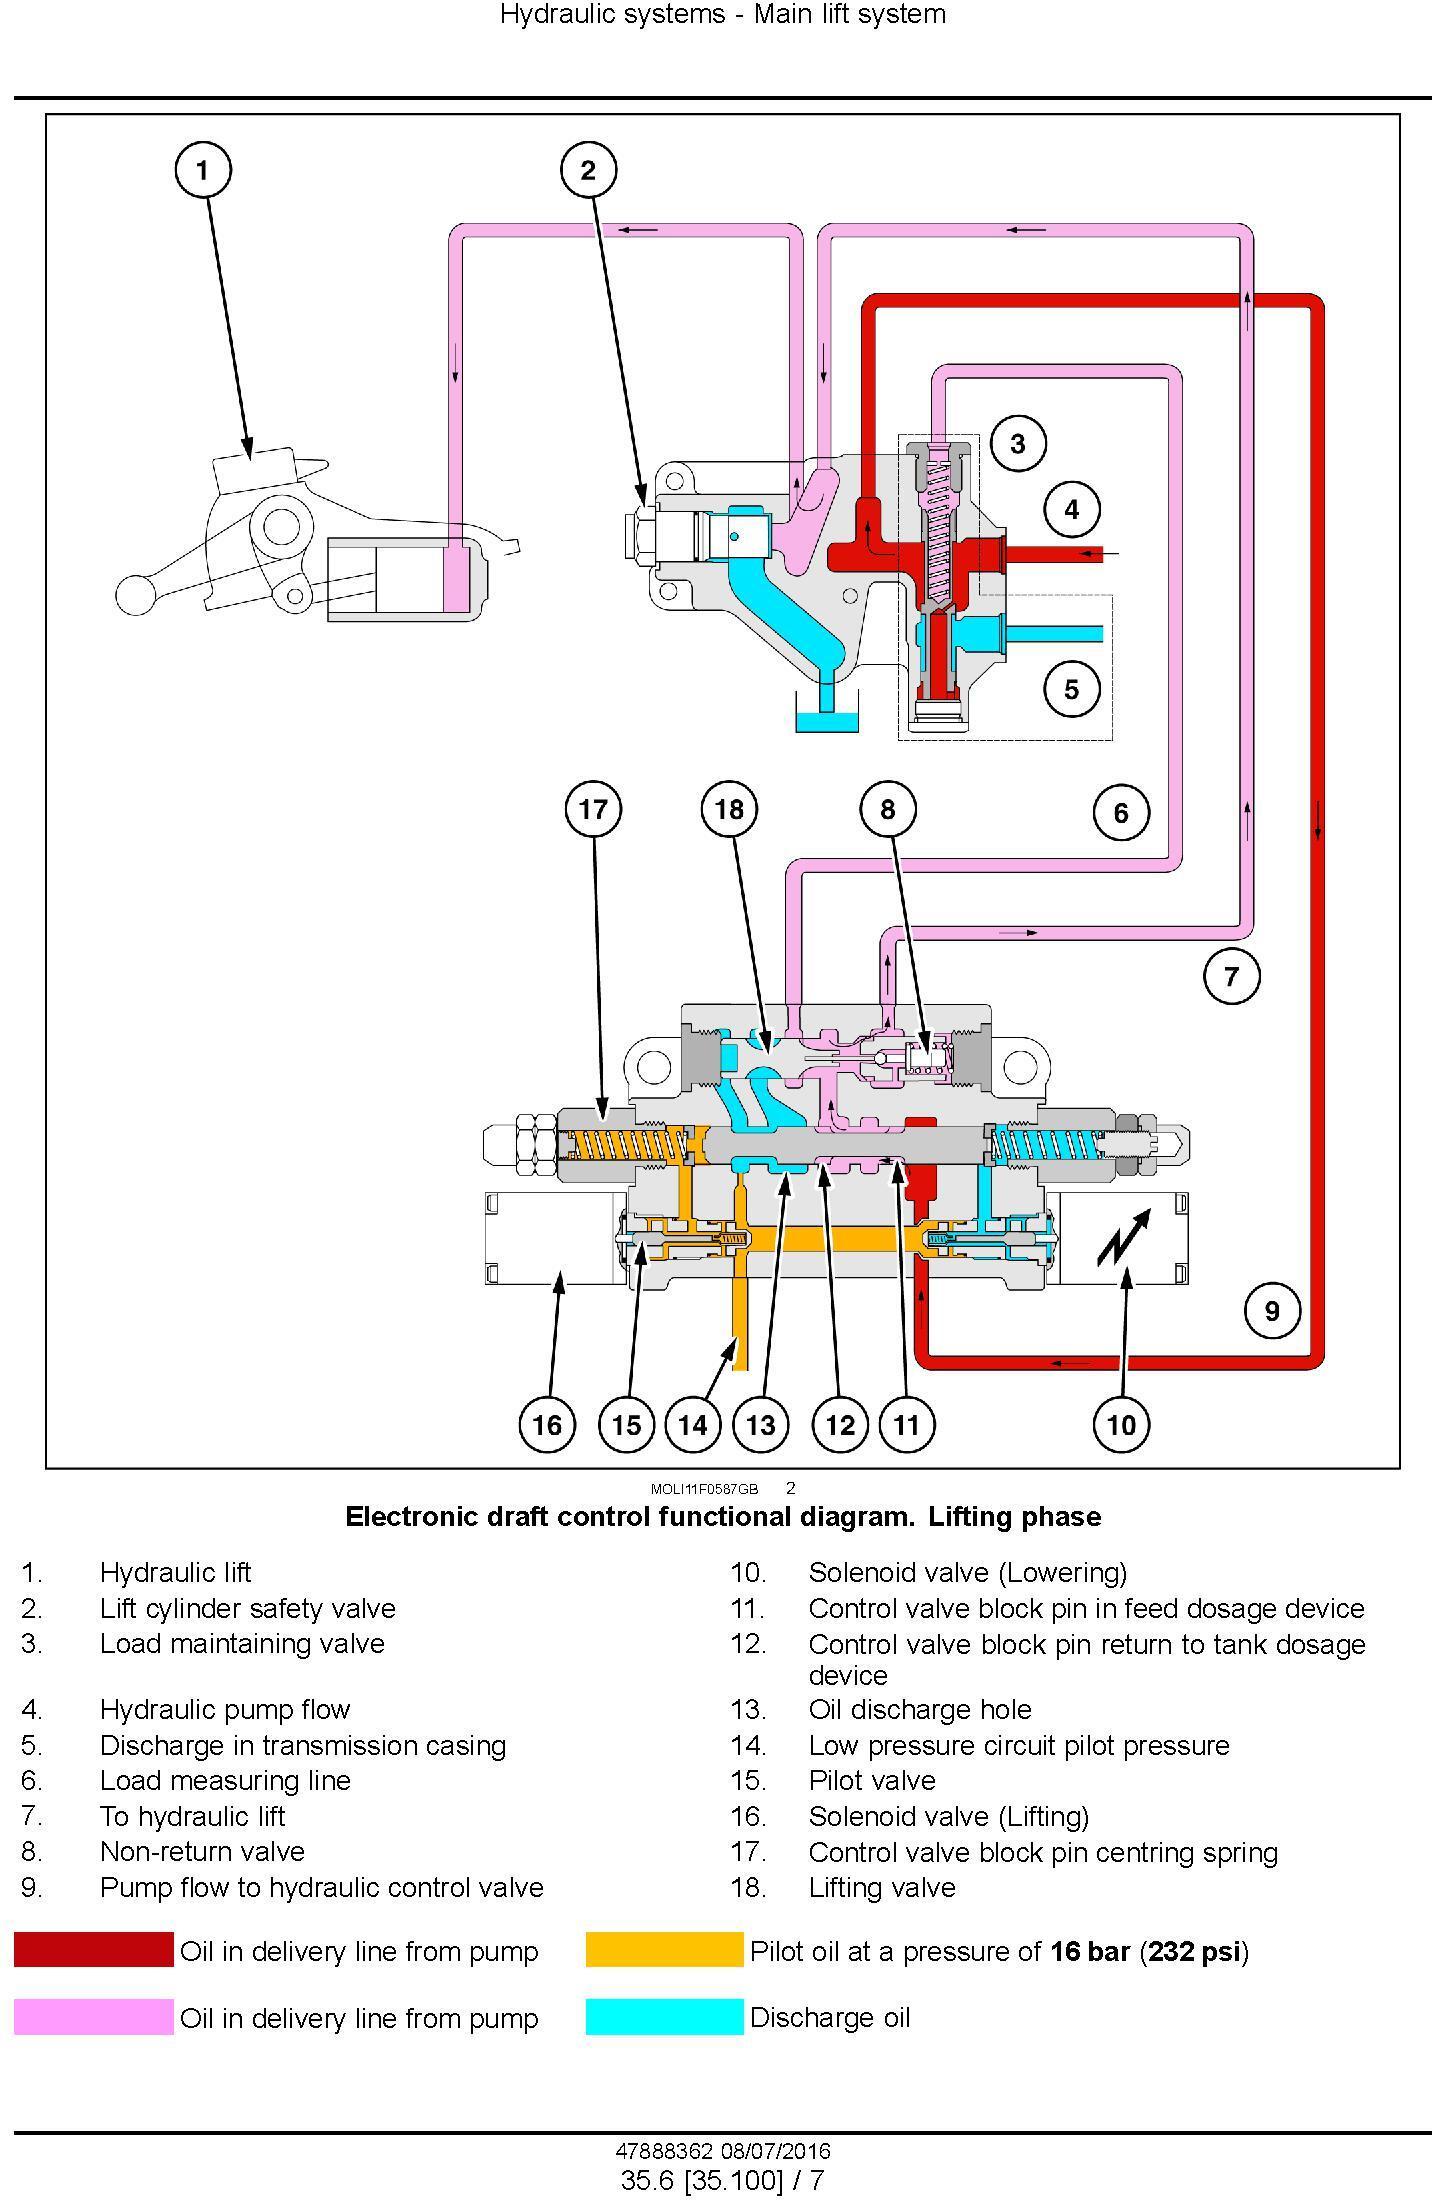 New Holland T4.75F, T4.85F, T4.95F, T4.105F Tier 3 Tractor Complete Service Manual (North America) - 3